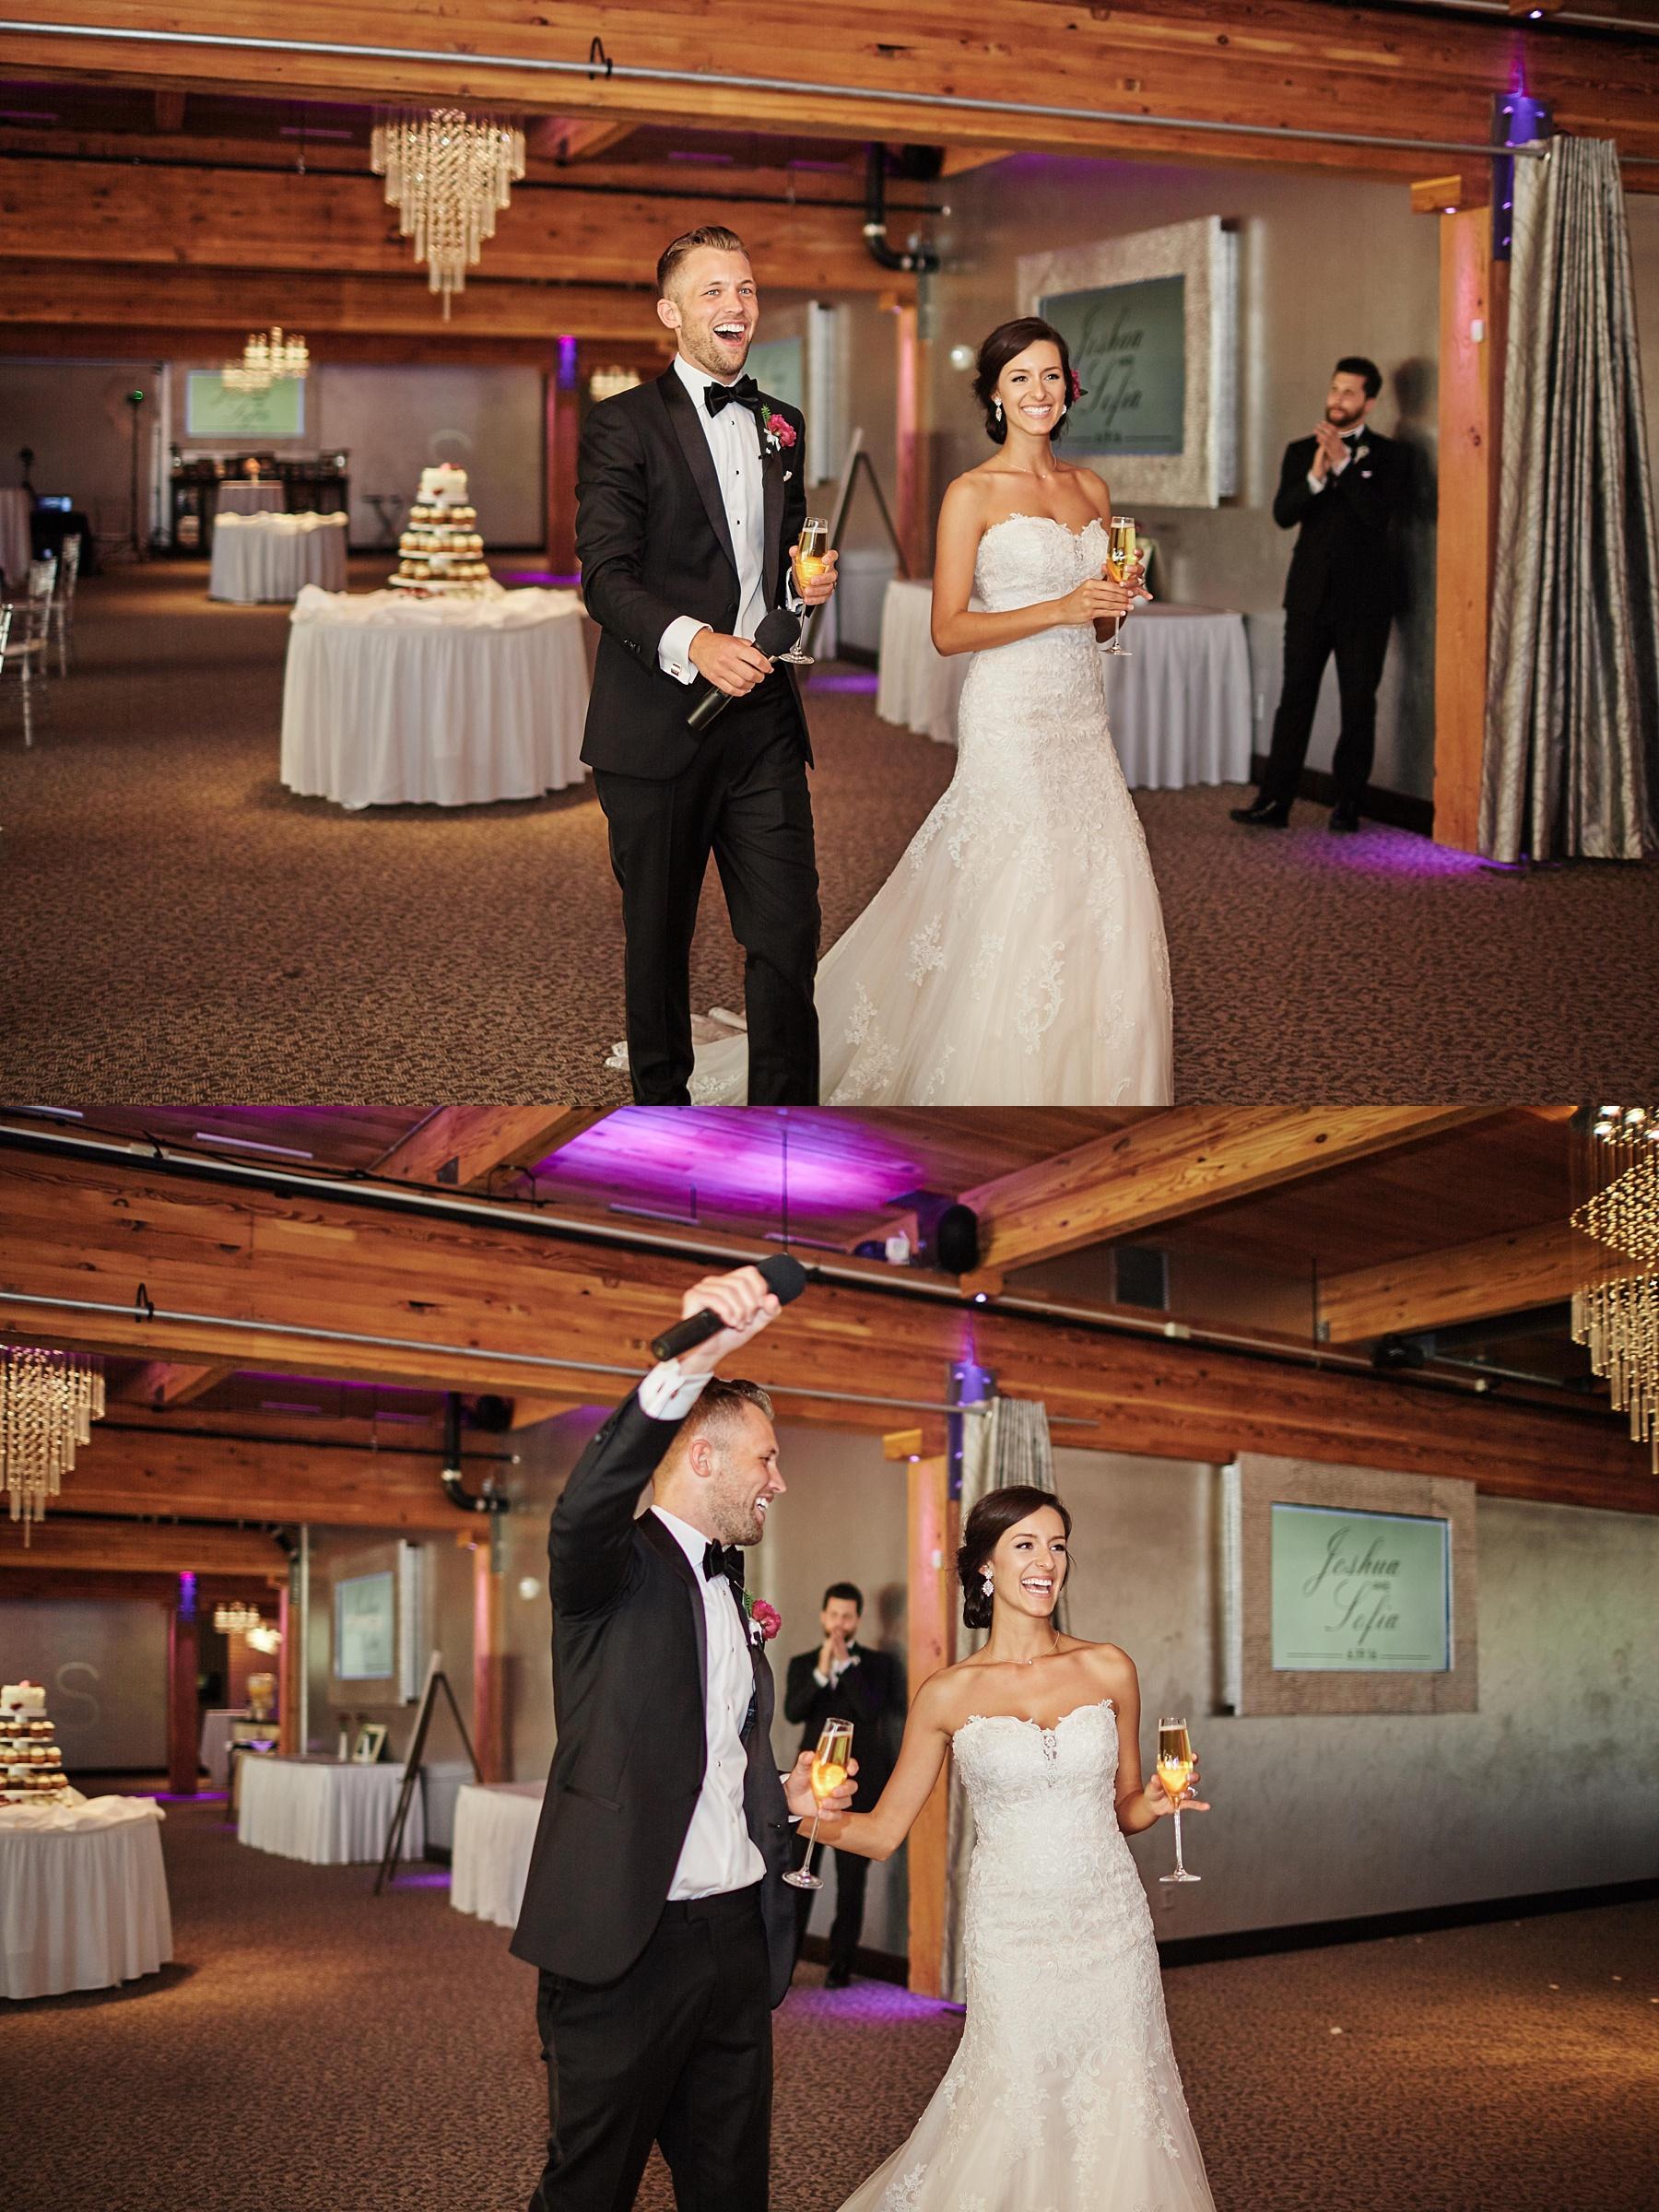 ABULAE-Wedding-Saint-paul-MN-Josh-Sofia-Wedding-Mears-Park_0808.jpg